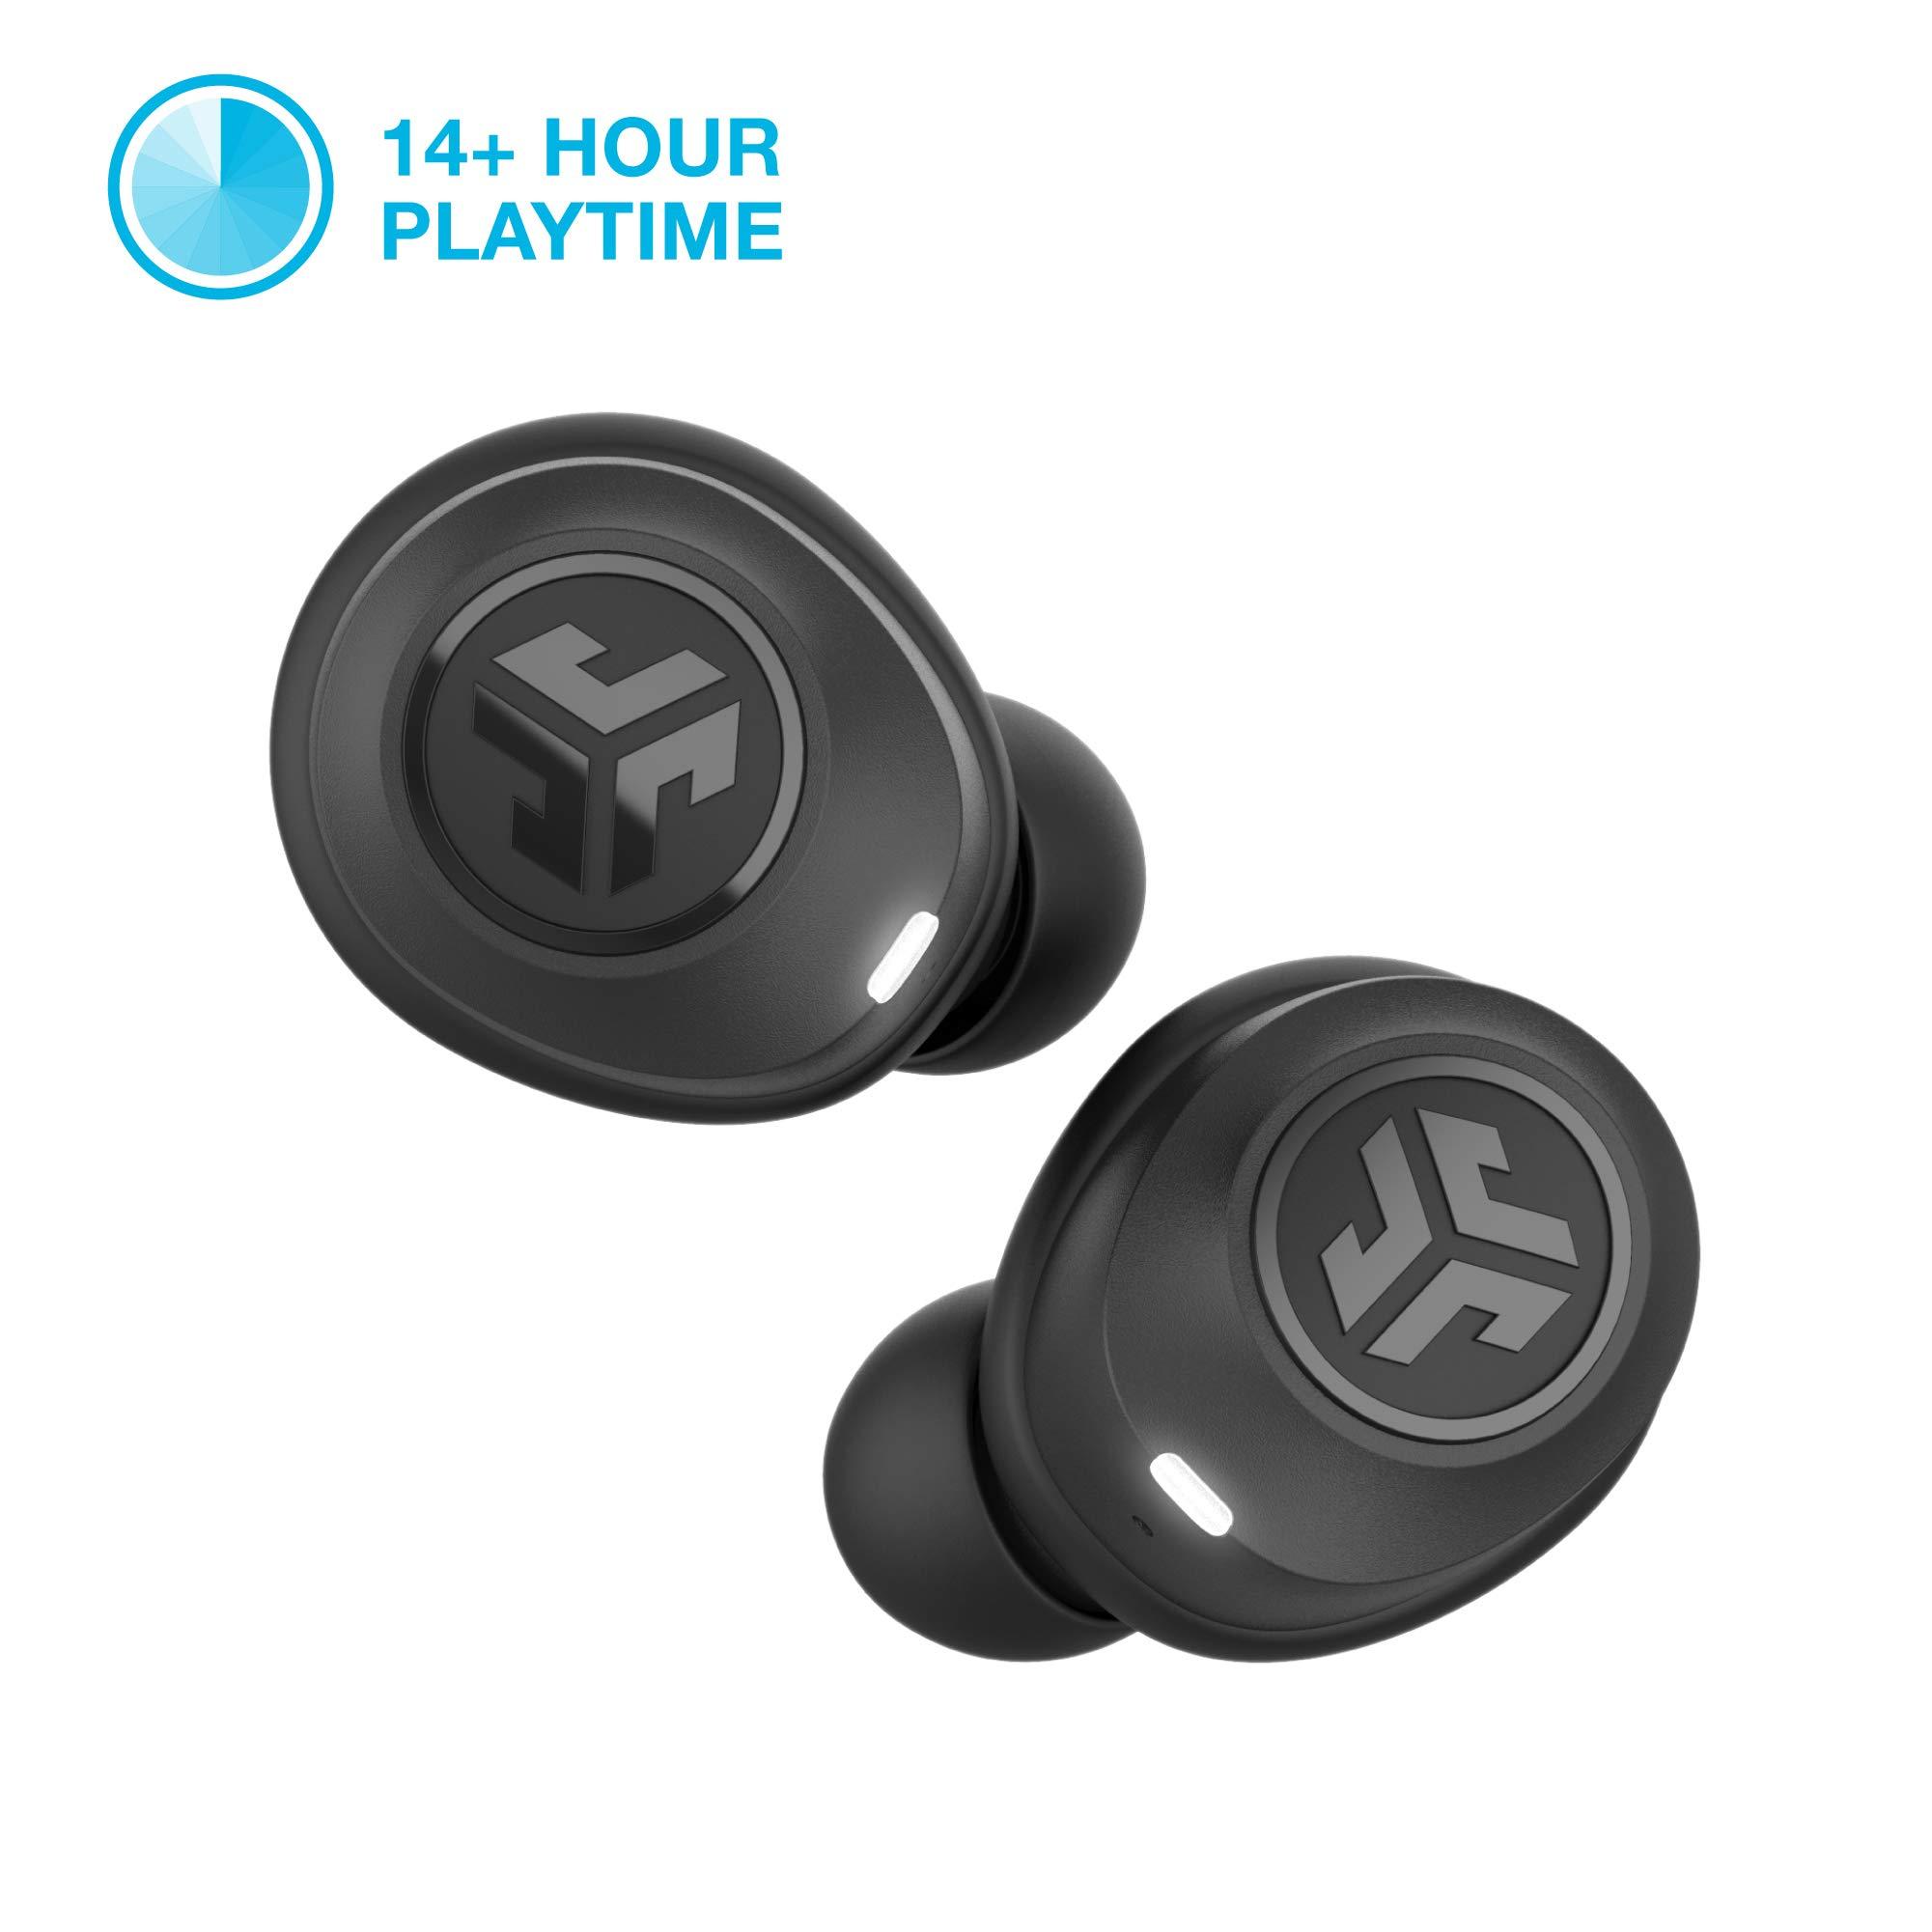 ویکالا · خرید  اصل اورجینال · خرید از آمازون · JLab Audio JBuds Air True Wireless Signature Bluetooth Earbuds + Charging Case - IP55 Sweat Resistance - Class 1 Bluetooth 5.0 Connection - 3 EQ Sound Settings: JLab Signature, Balanced, Bass Boost wekala · ویکالا